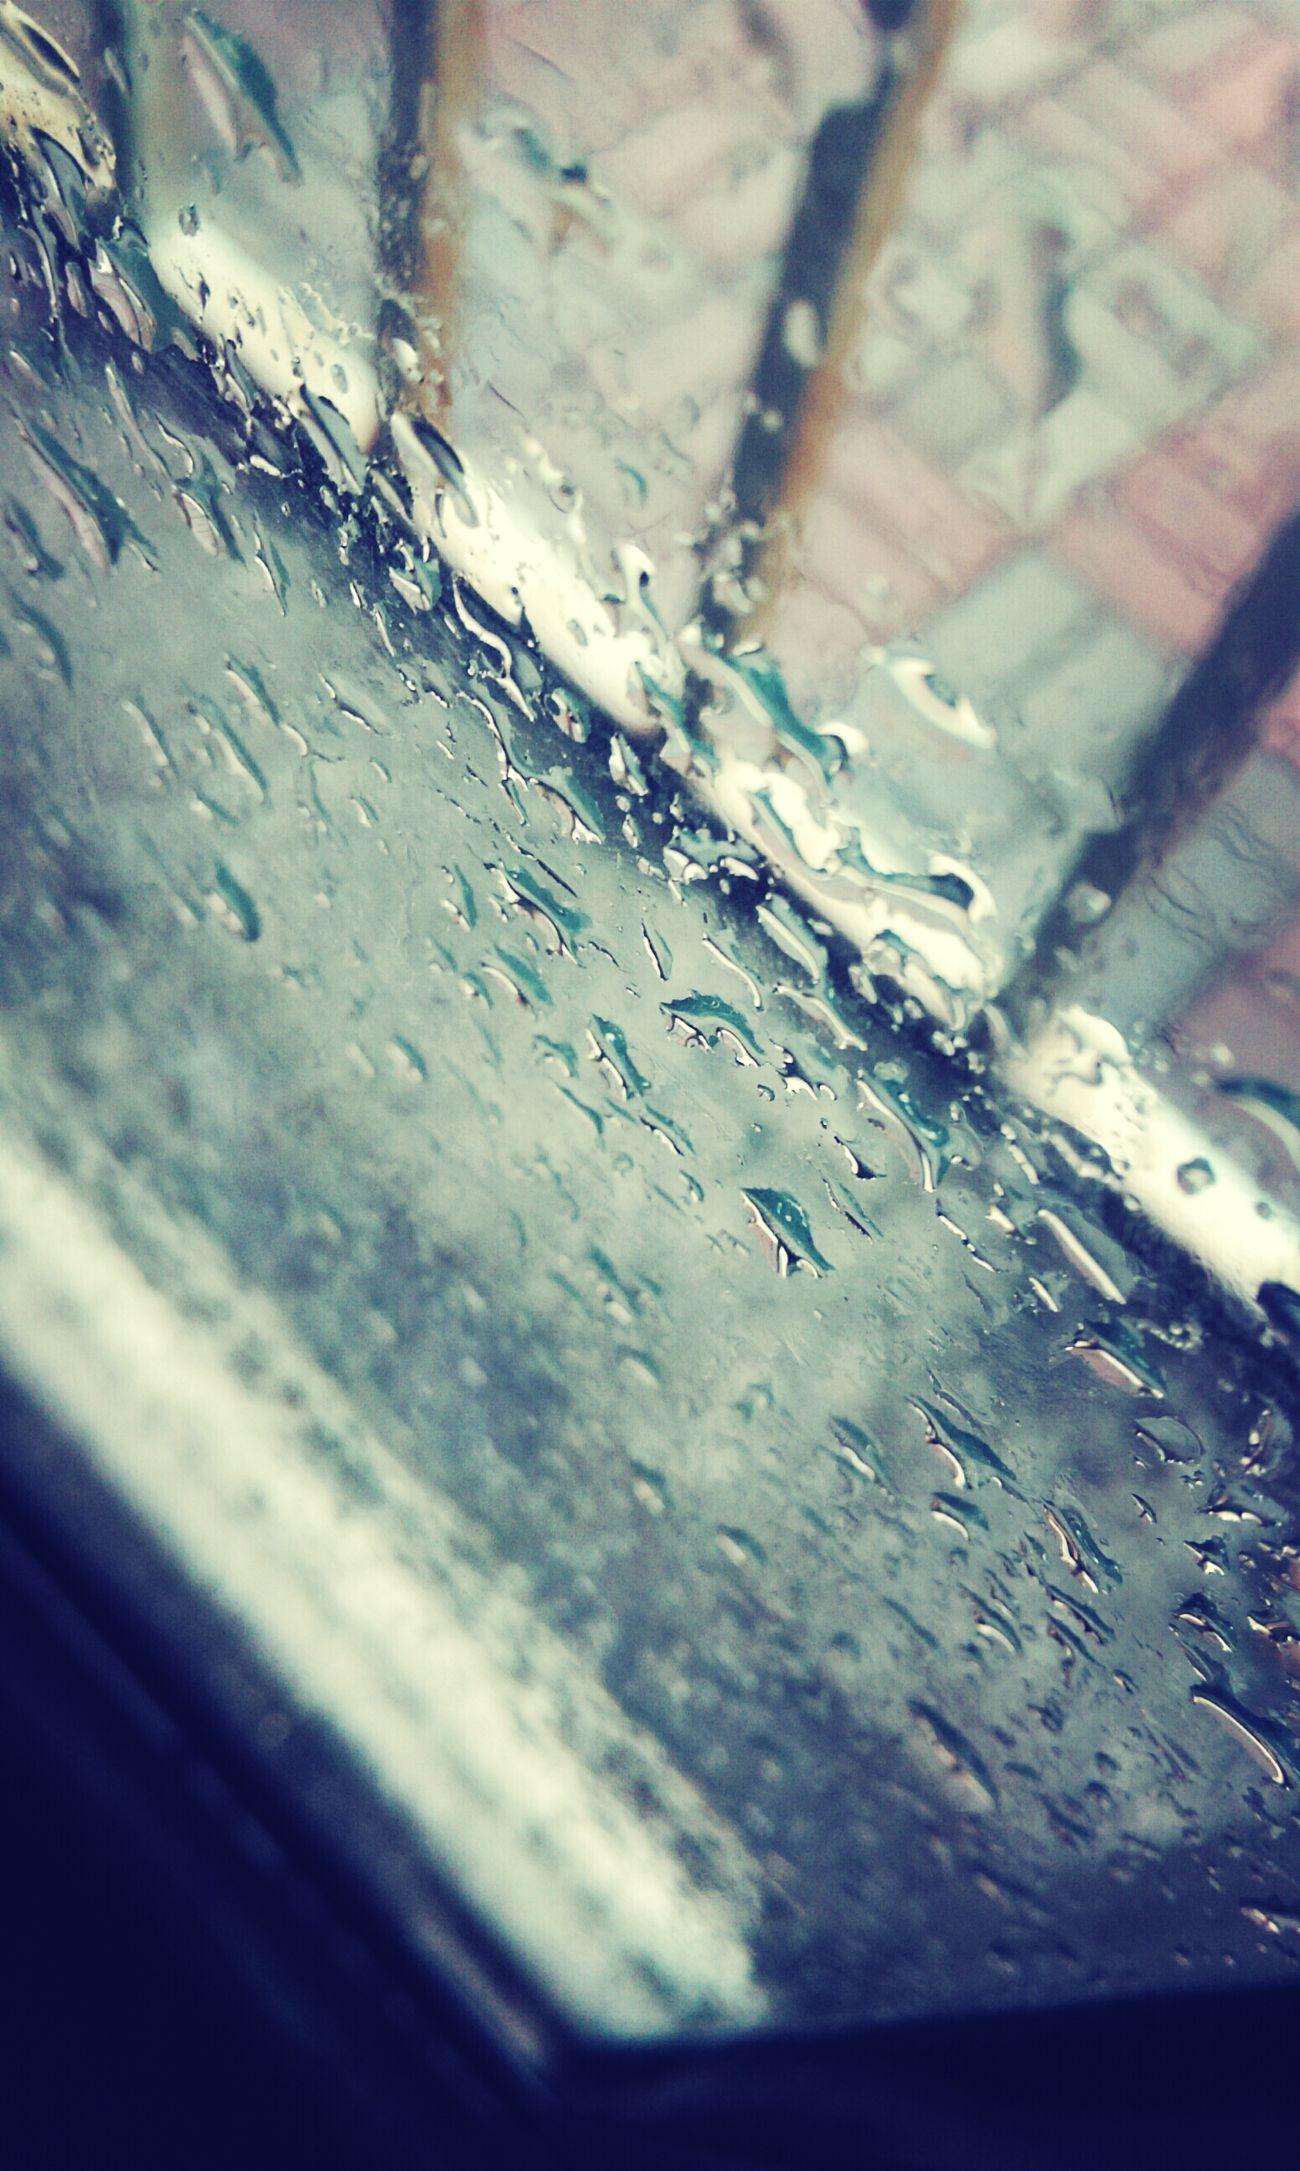 Raining Outside Beautiful Sight Raining Day Enjoying Life